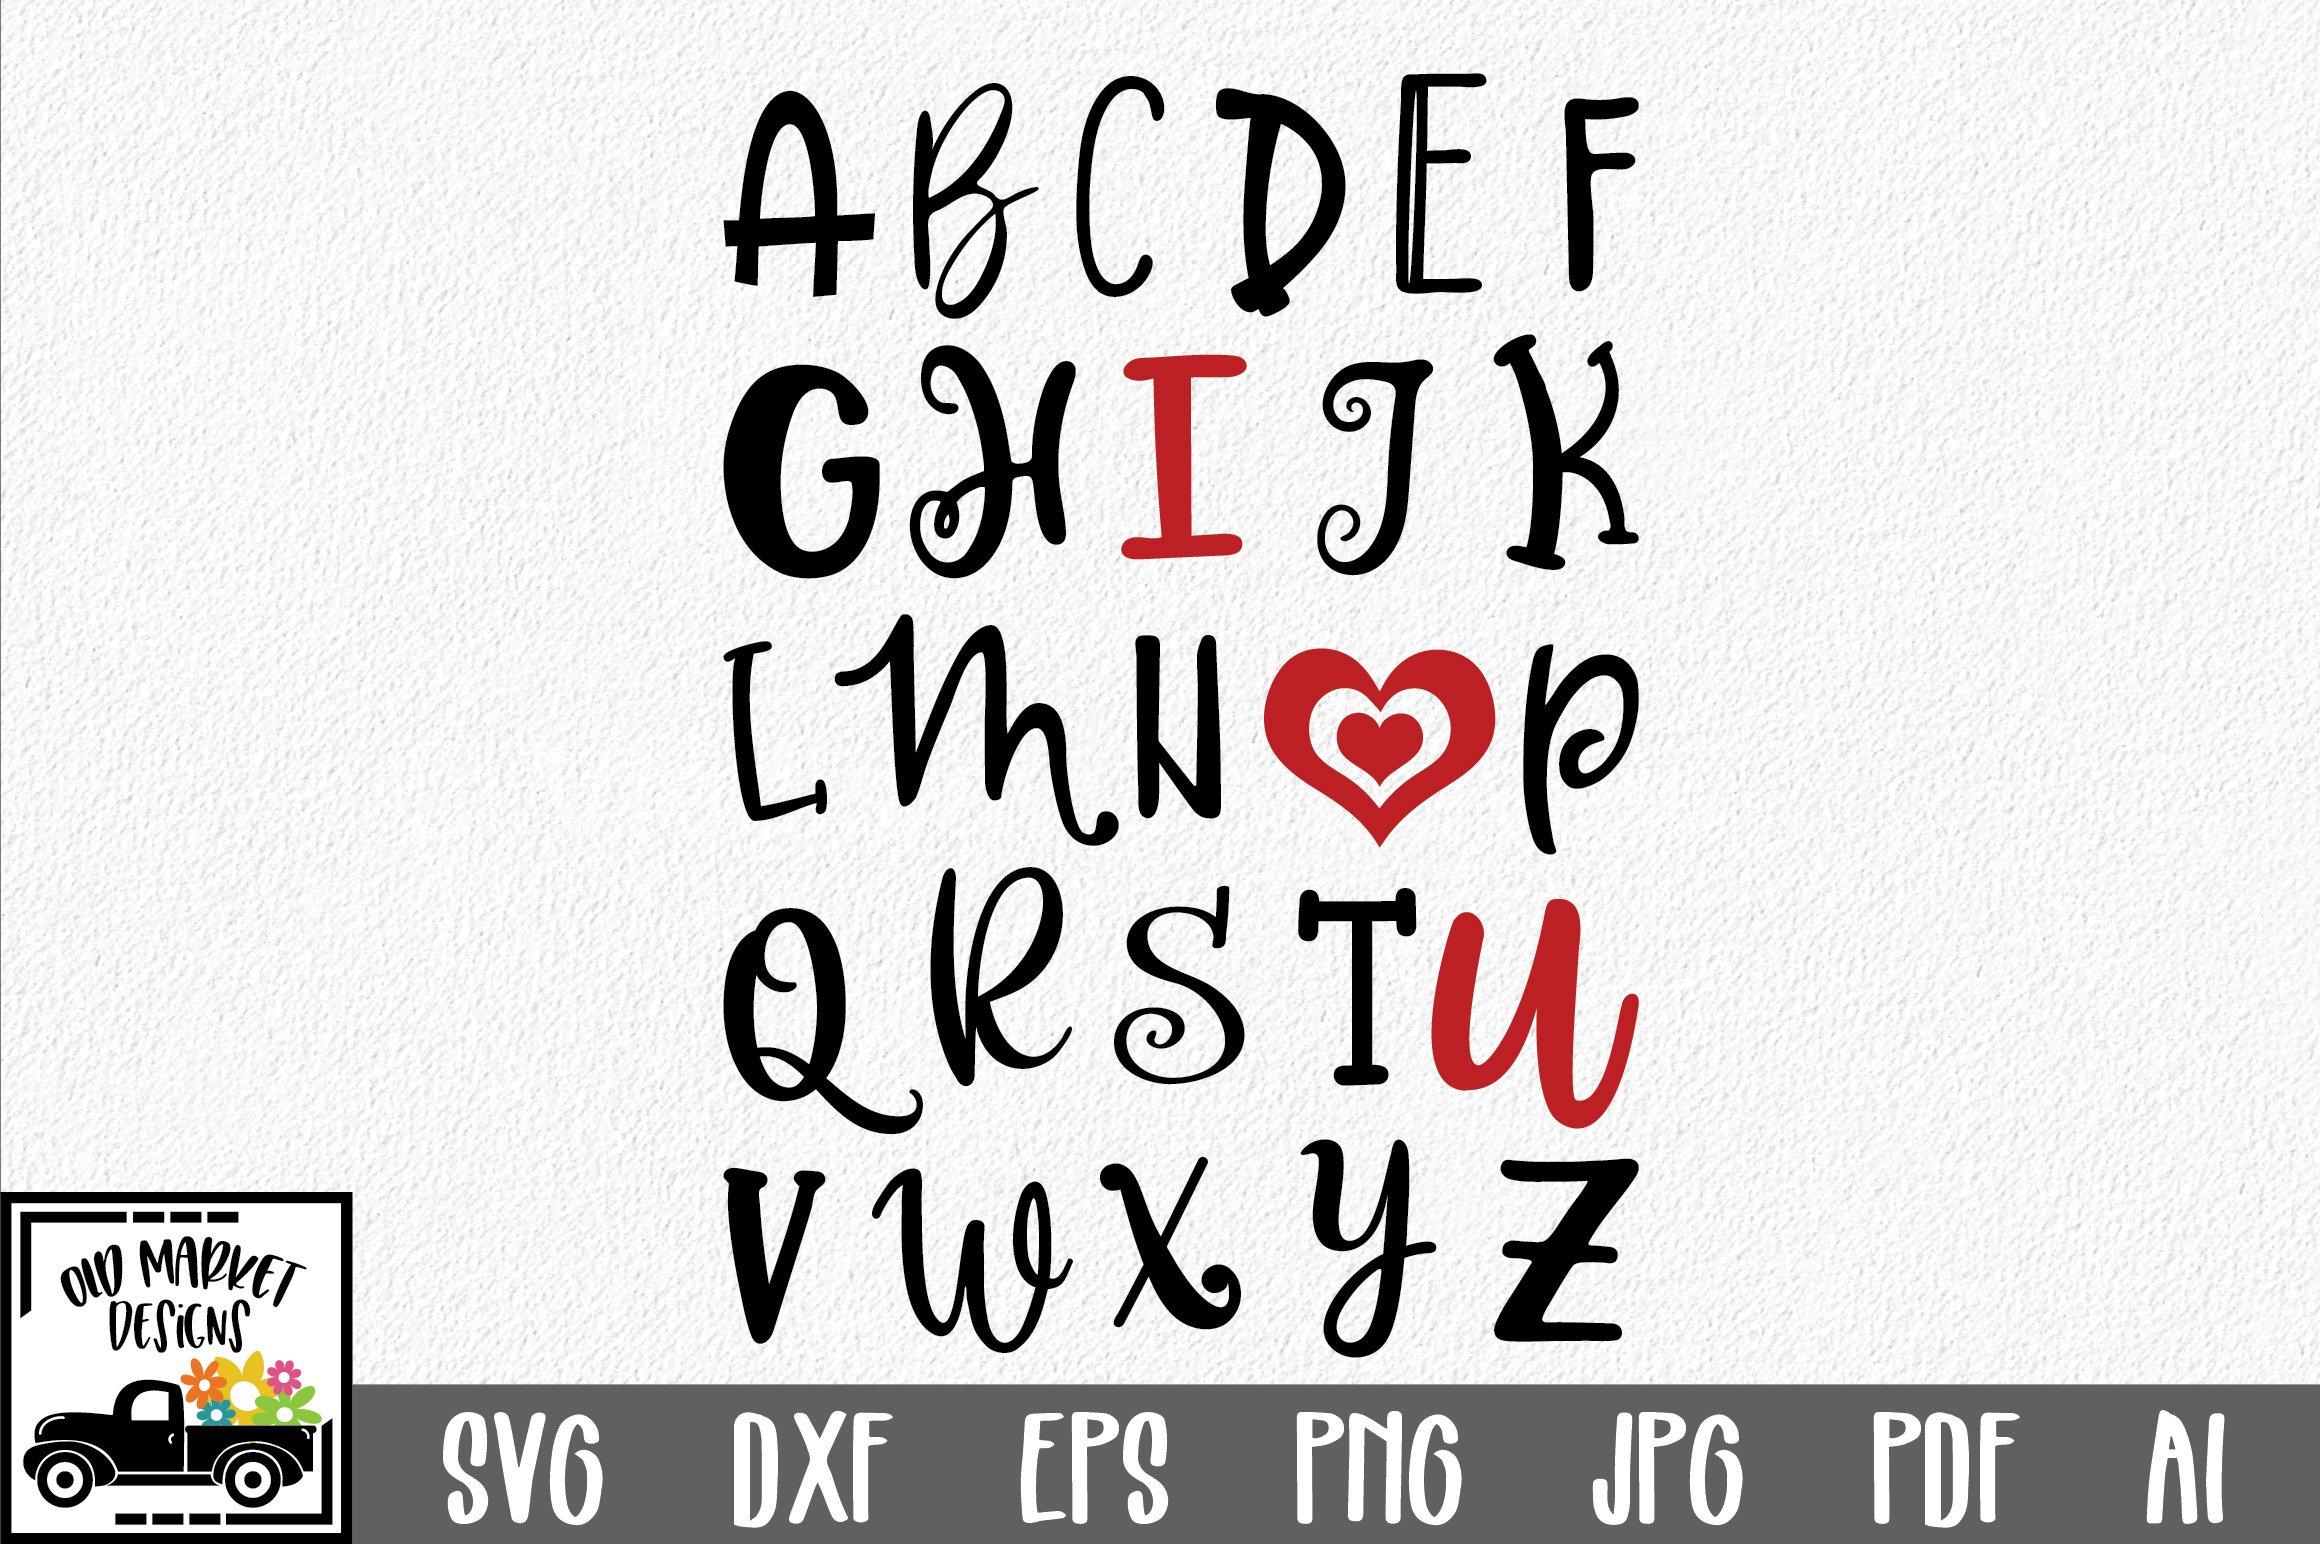 Abc I Love You Svg Cut File Svg Eps Dxf Png Pdf Ai 180249 Svgs Design Bundles